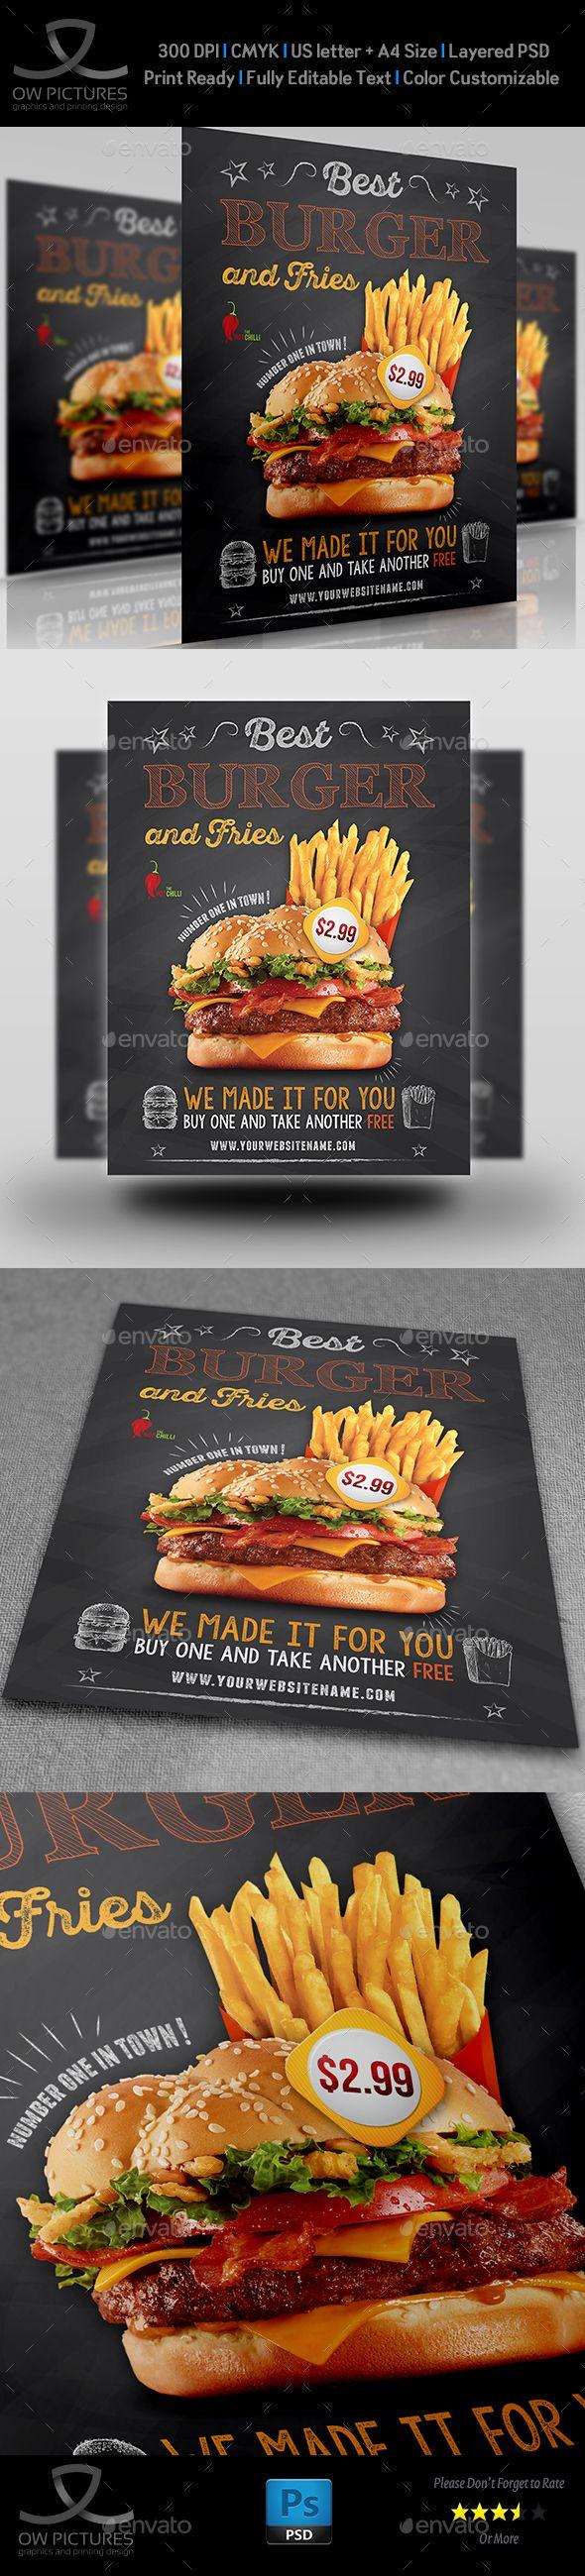 Burger Restaurant Flyer Template Vol  Restaurant Flyers  Flyer